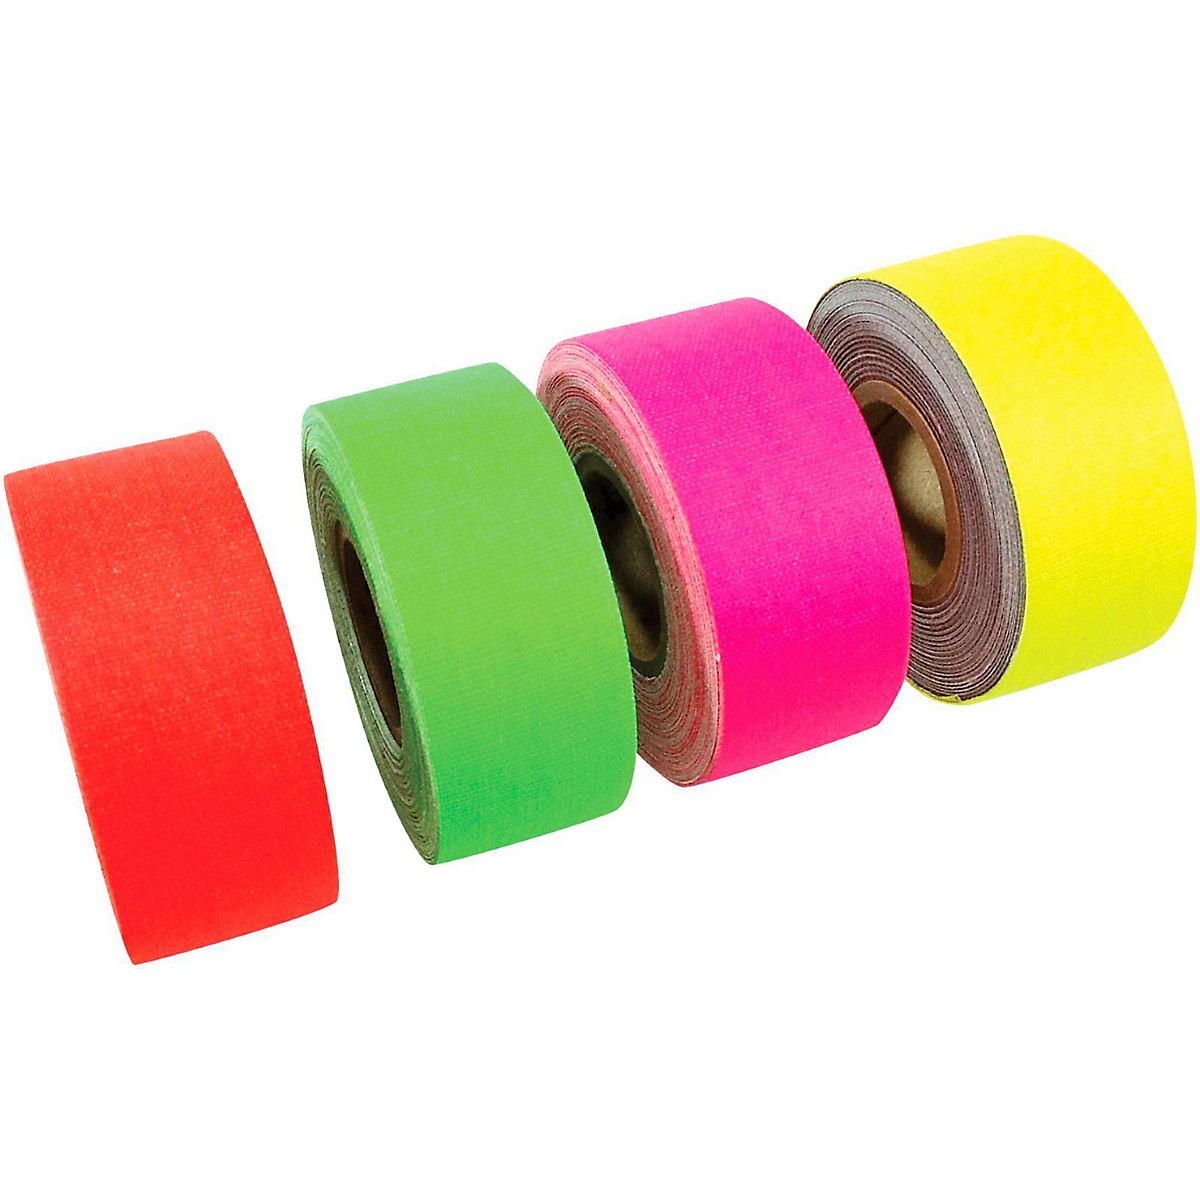 American Recorder Technologies Mini Roll Gaffers Tape 1 In x 8 Yards - Green, Yellow, Pink, Orange